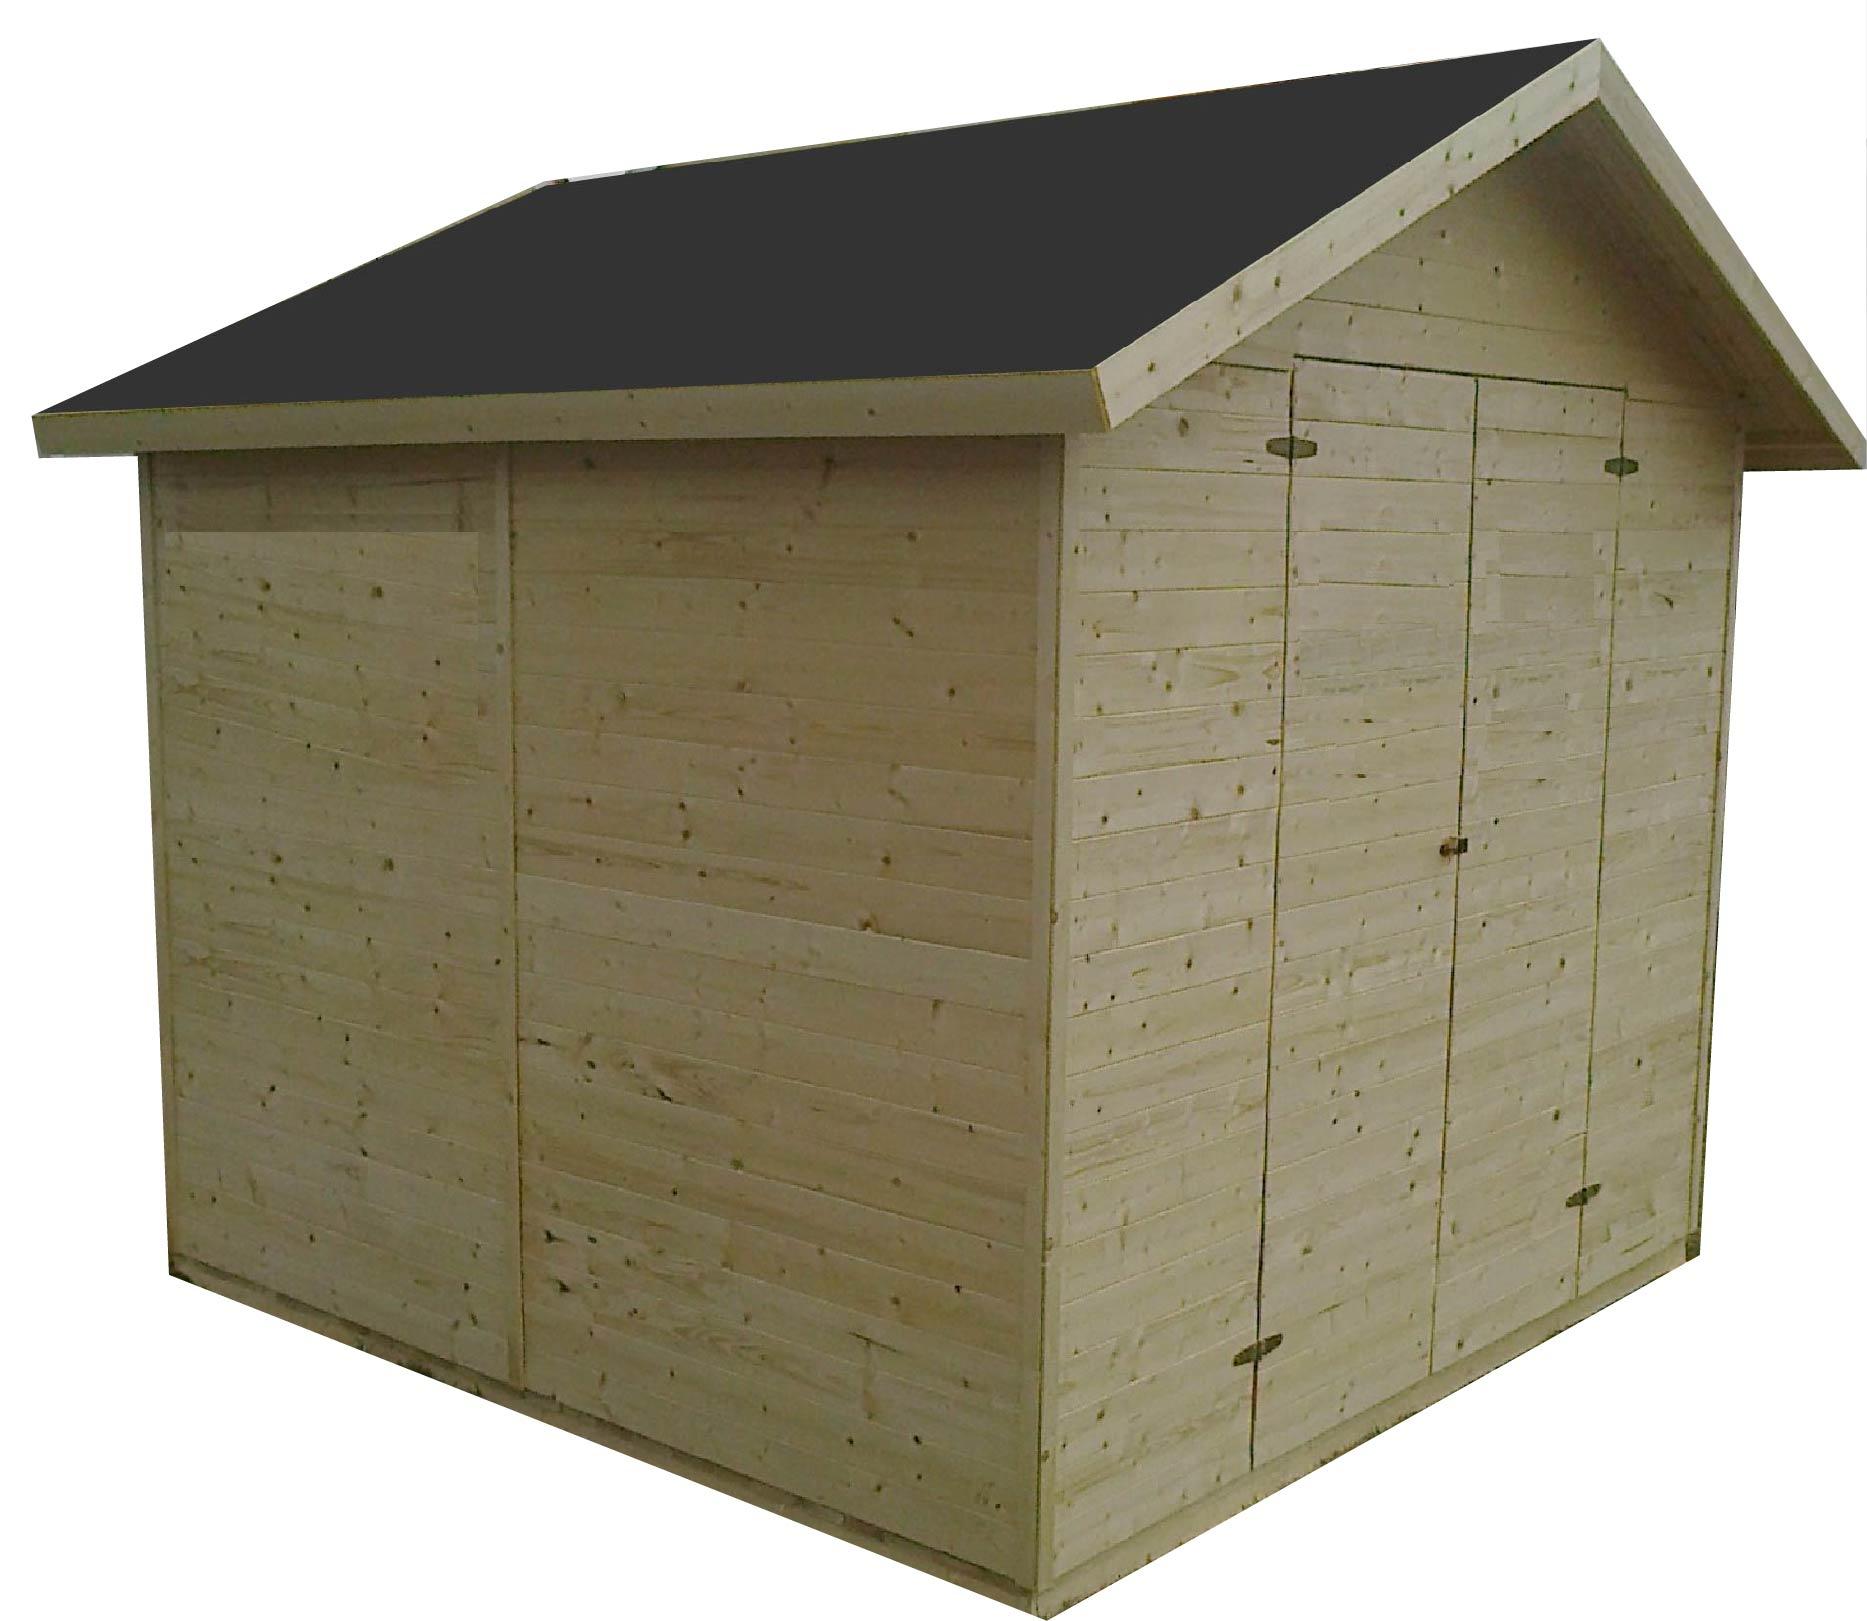 gartenh user bis 12 m2 gartenhaus aus holz 3 3m x 3 3m 16mm valencia ger tehaus cadema. Black Bedroom Furniture Sets. Home Design Ideas